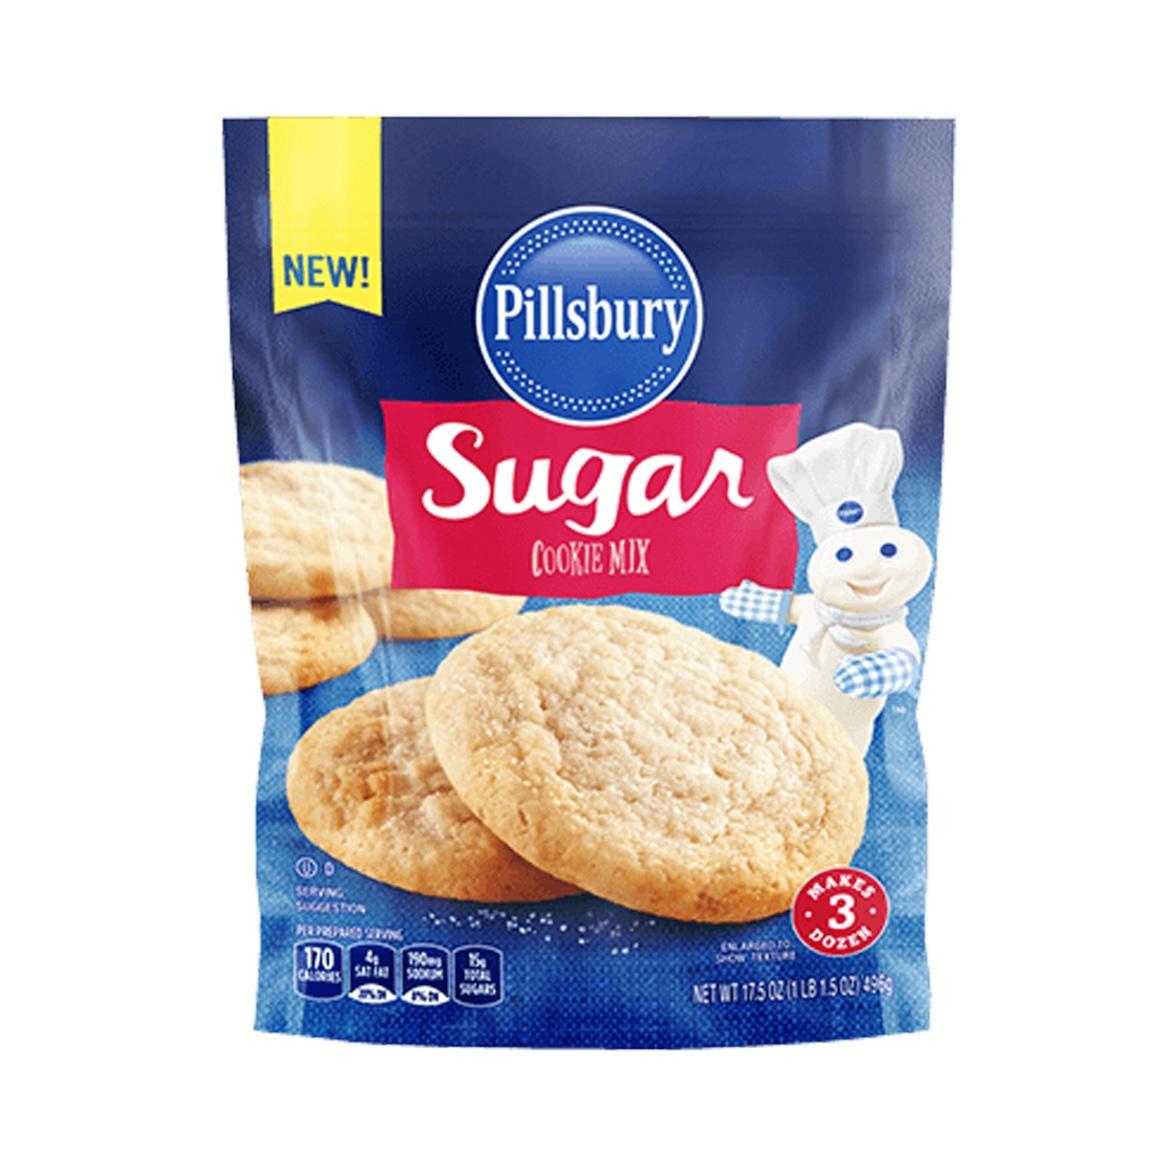 Pillsbury Sugar Cookie Mix 496g